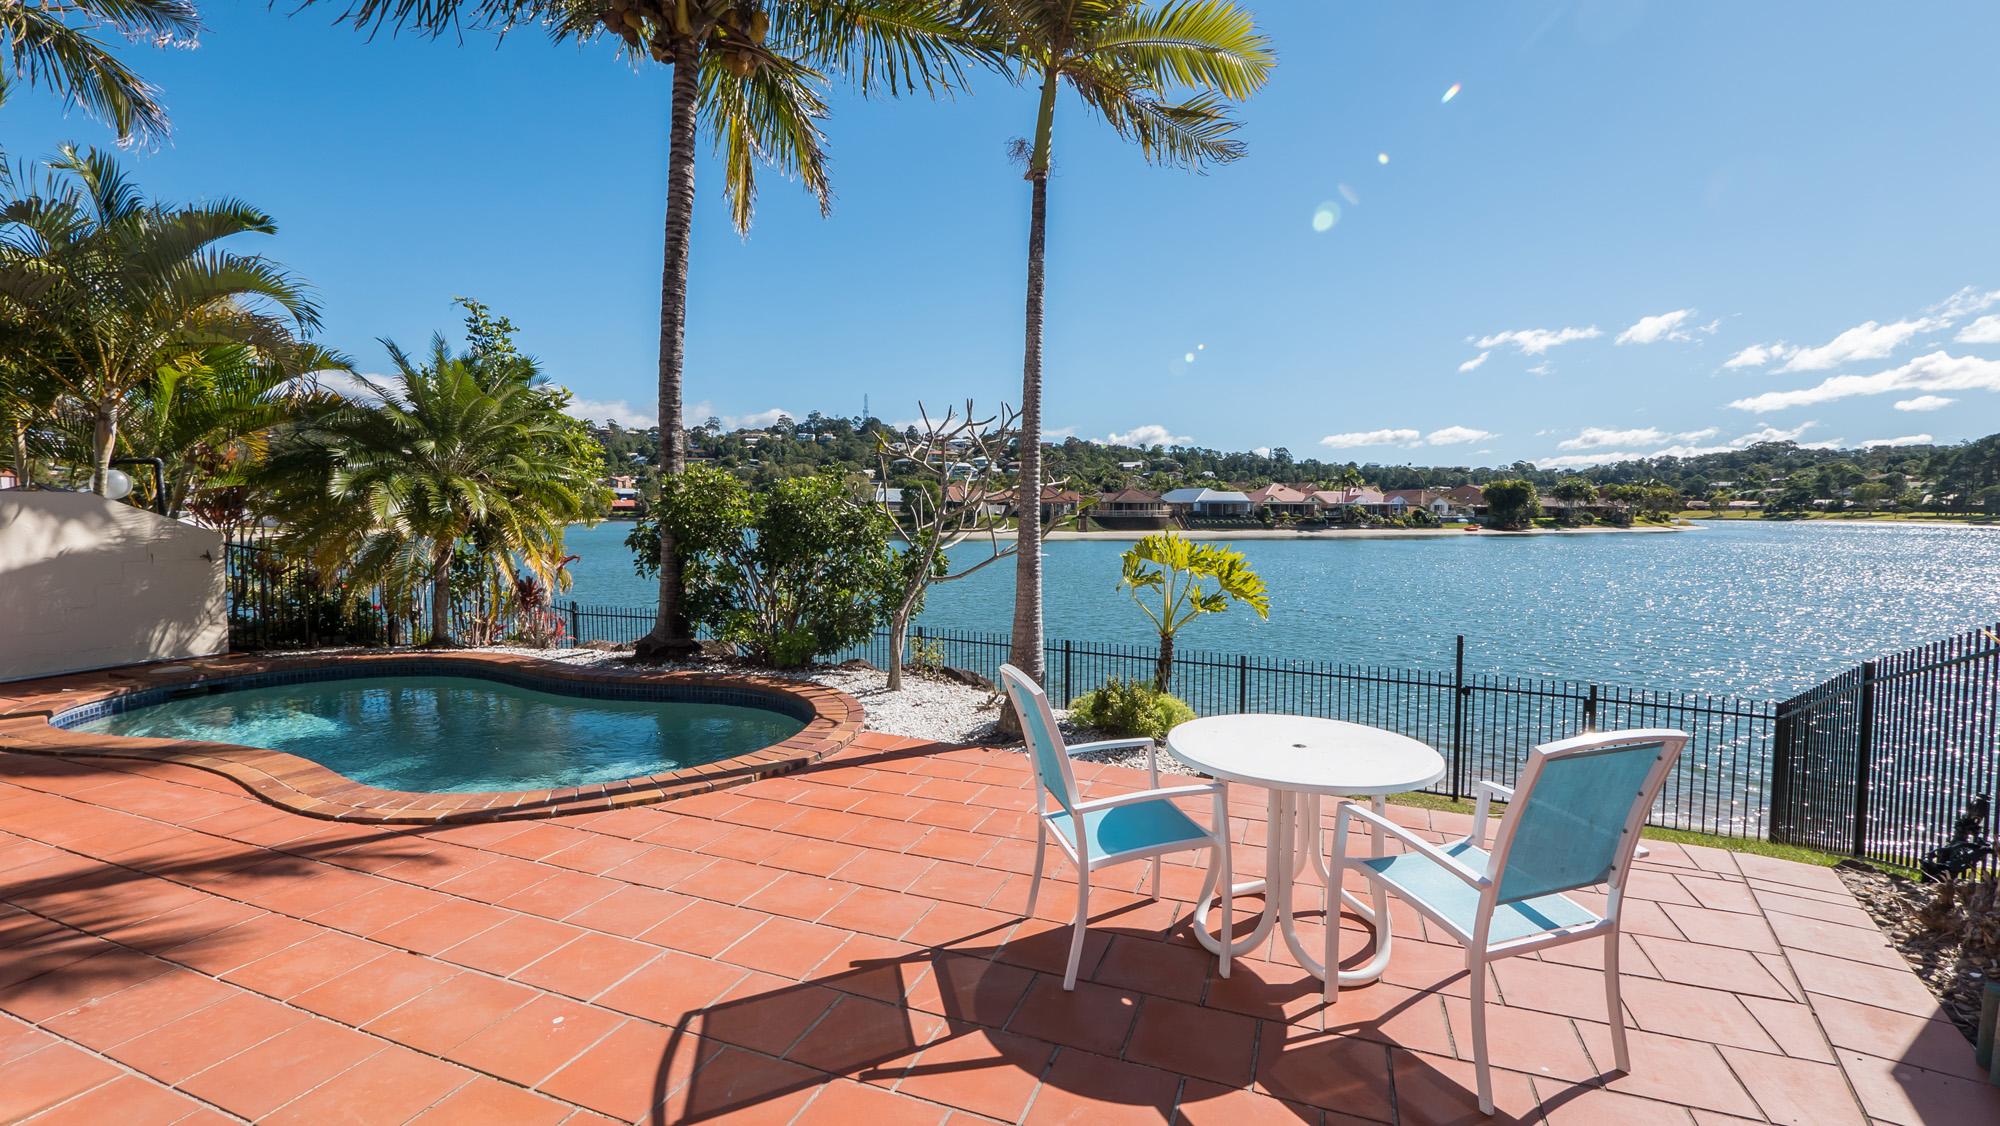 Isle Of Palms Resort Facilities - Pool Waterfront